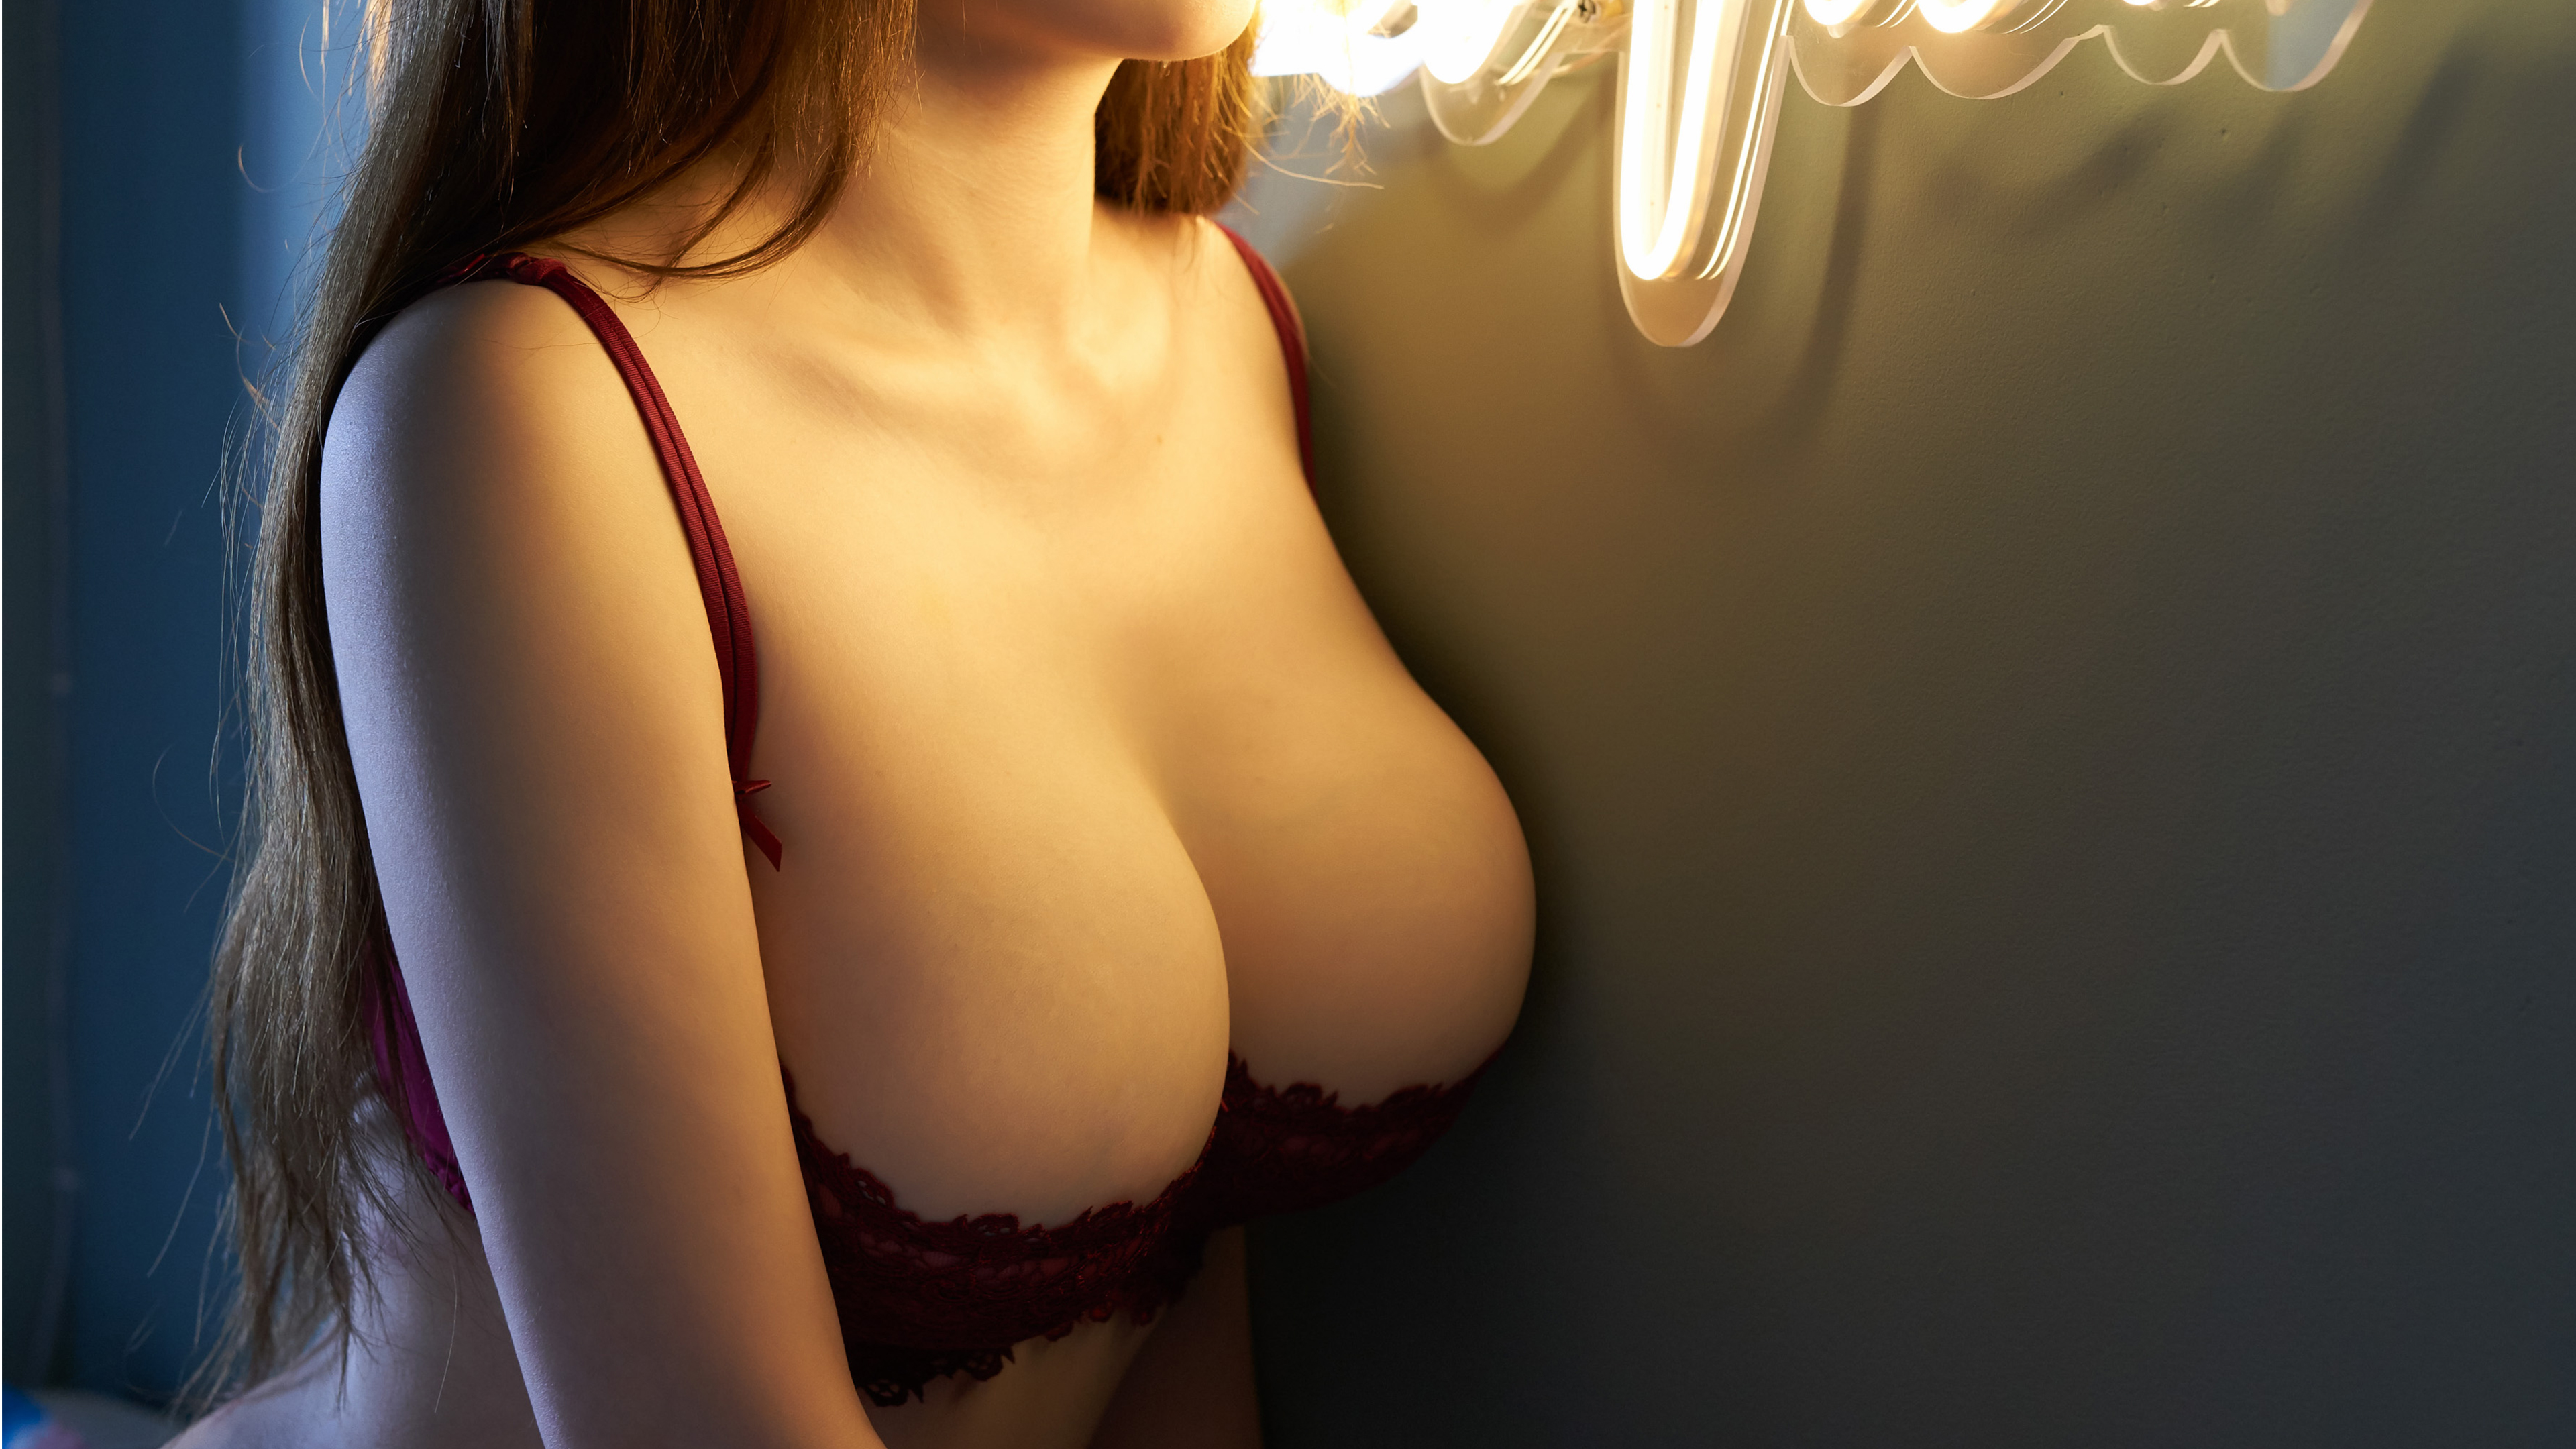 People 3840x2160 push-up bras neon glow long hair Asian women huge breasts big boobs Xue Li Sherry Chinese